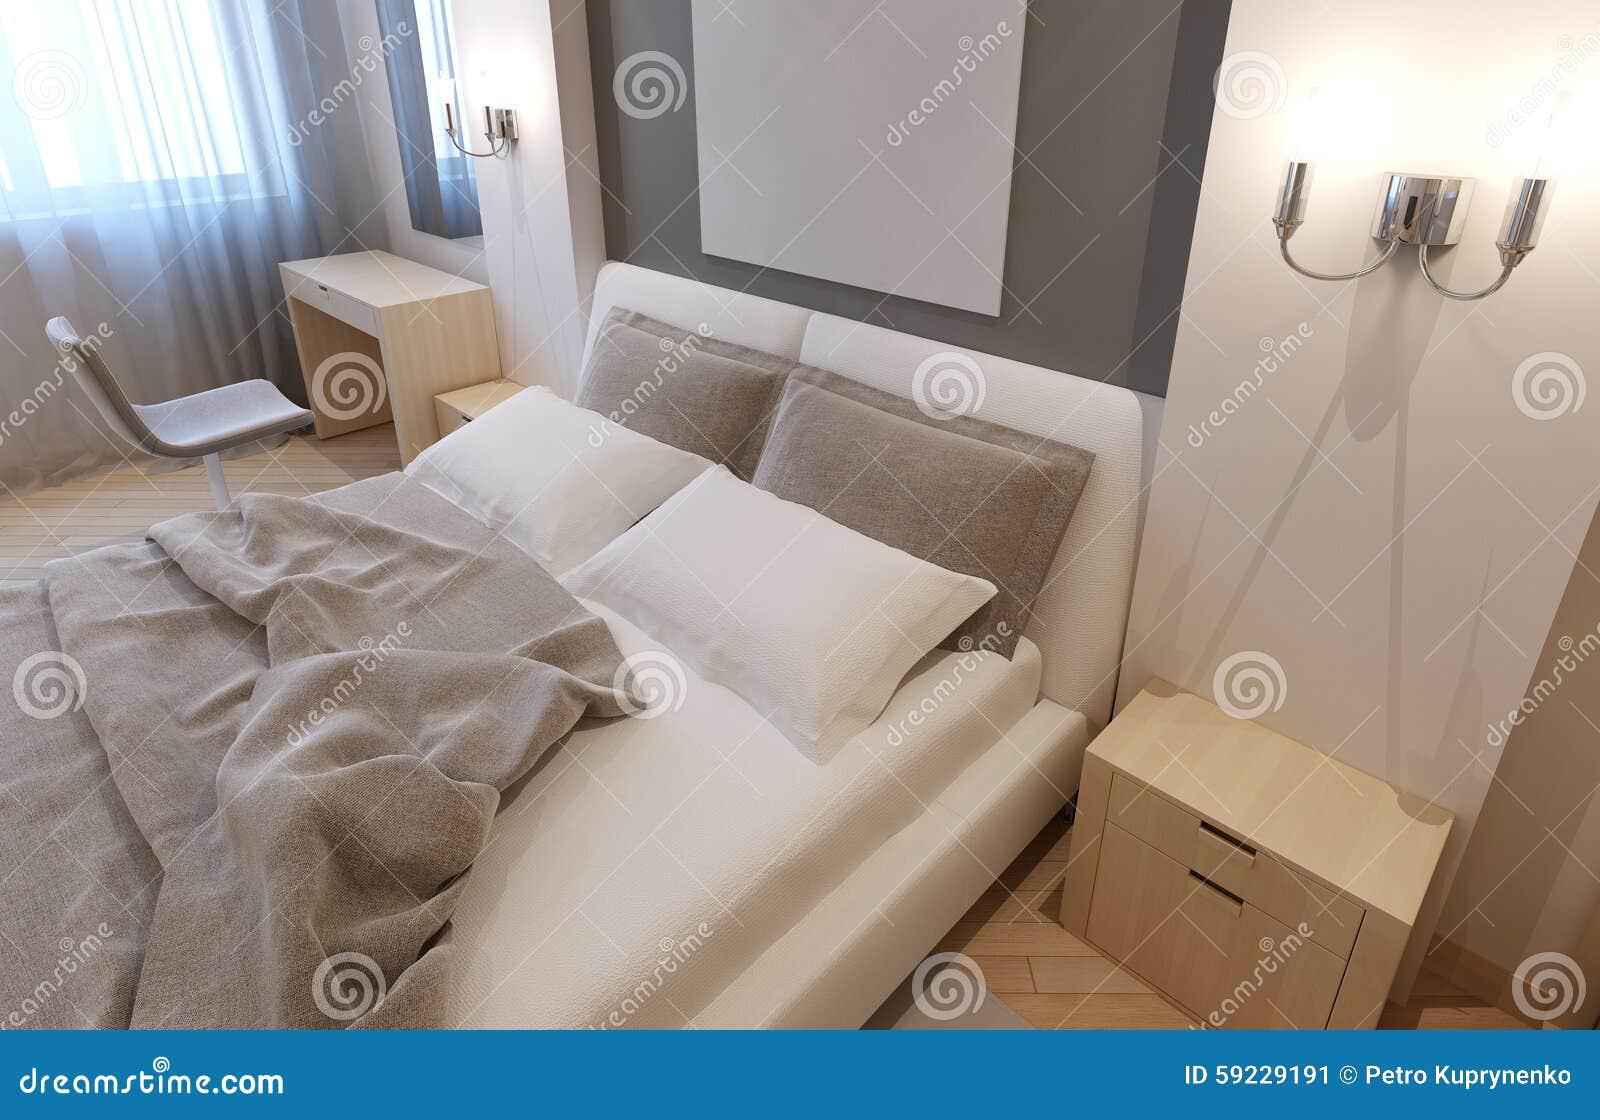 Apartamento moderno del hotel